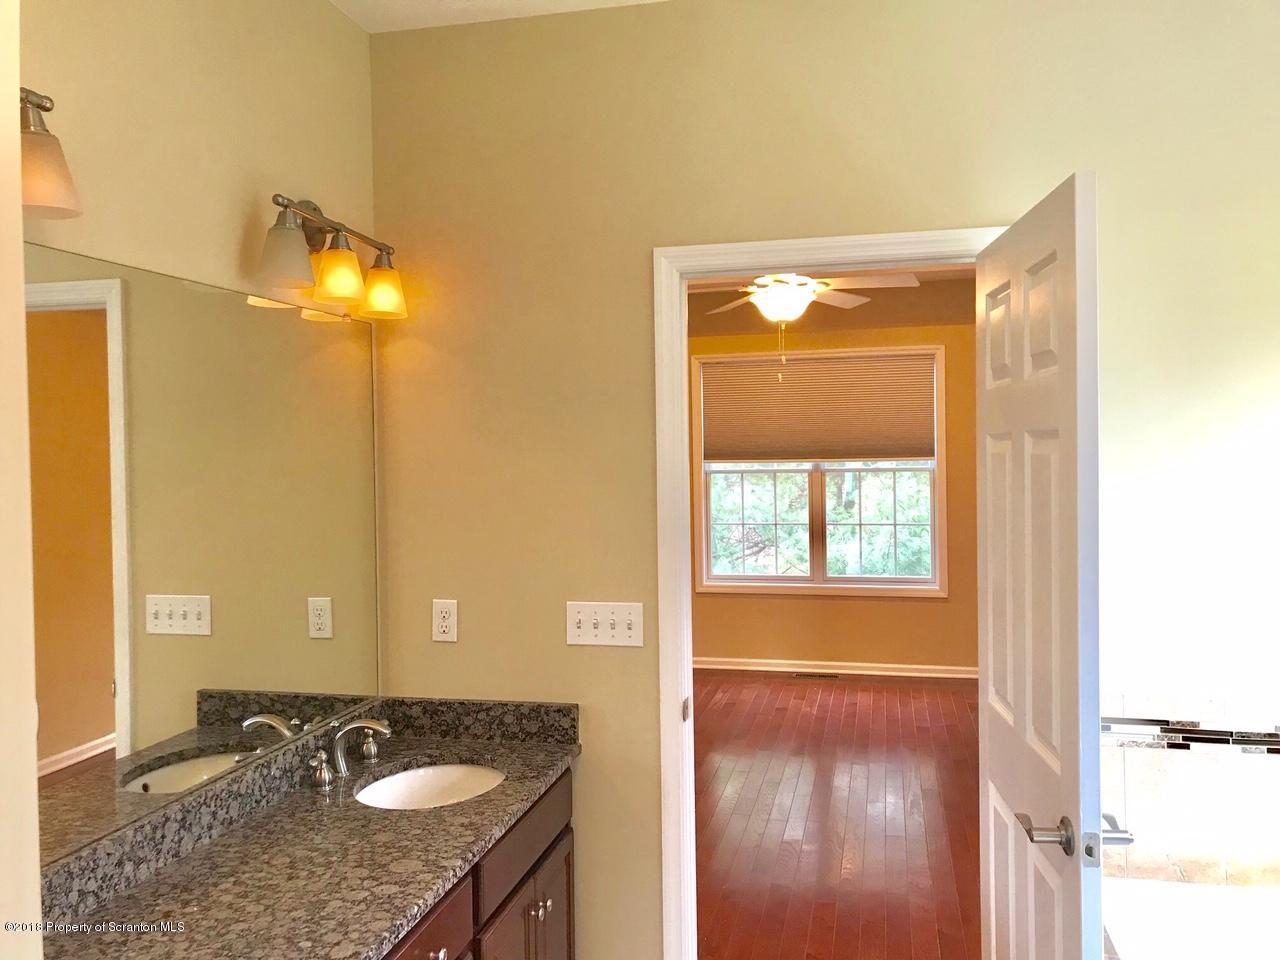 6 Dickinson Close, Moosic, Pennsylvania 18507, 2 Bedrooms Bedrooms, 8 Rooms Rooms,3 BathroomsBathrooms,Single Family,For Sale,Dickinson Close,19-2